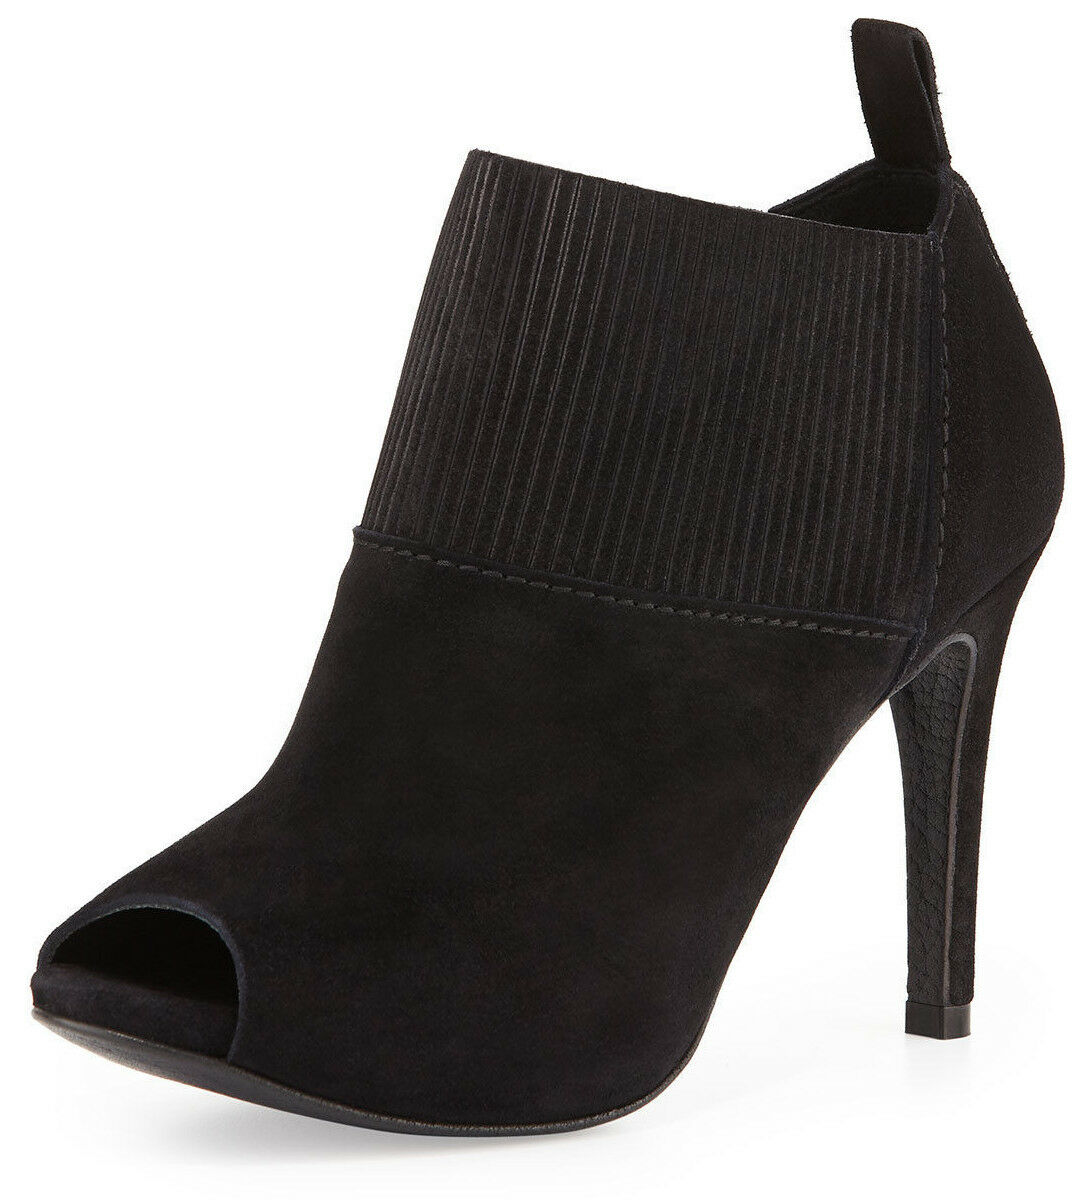 Pedro Garcia Women's Black Sondra Suede Peep-Toe Booties Size 39.5